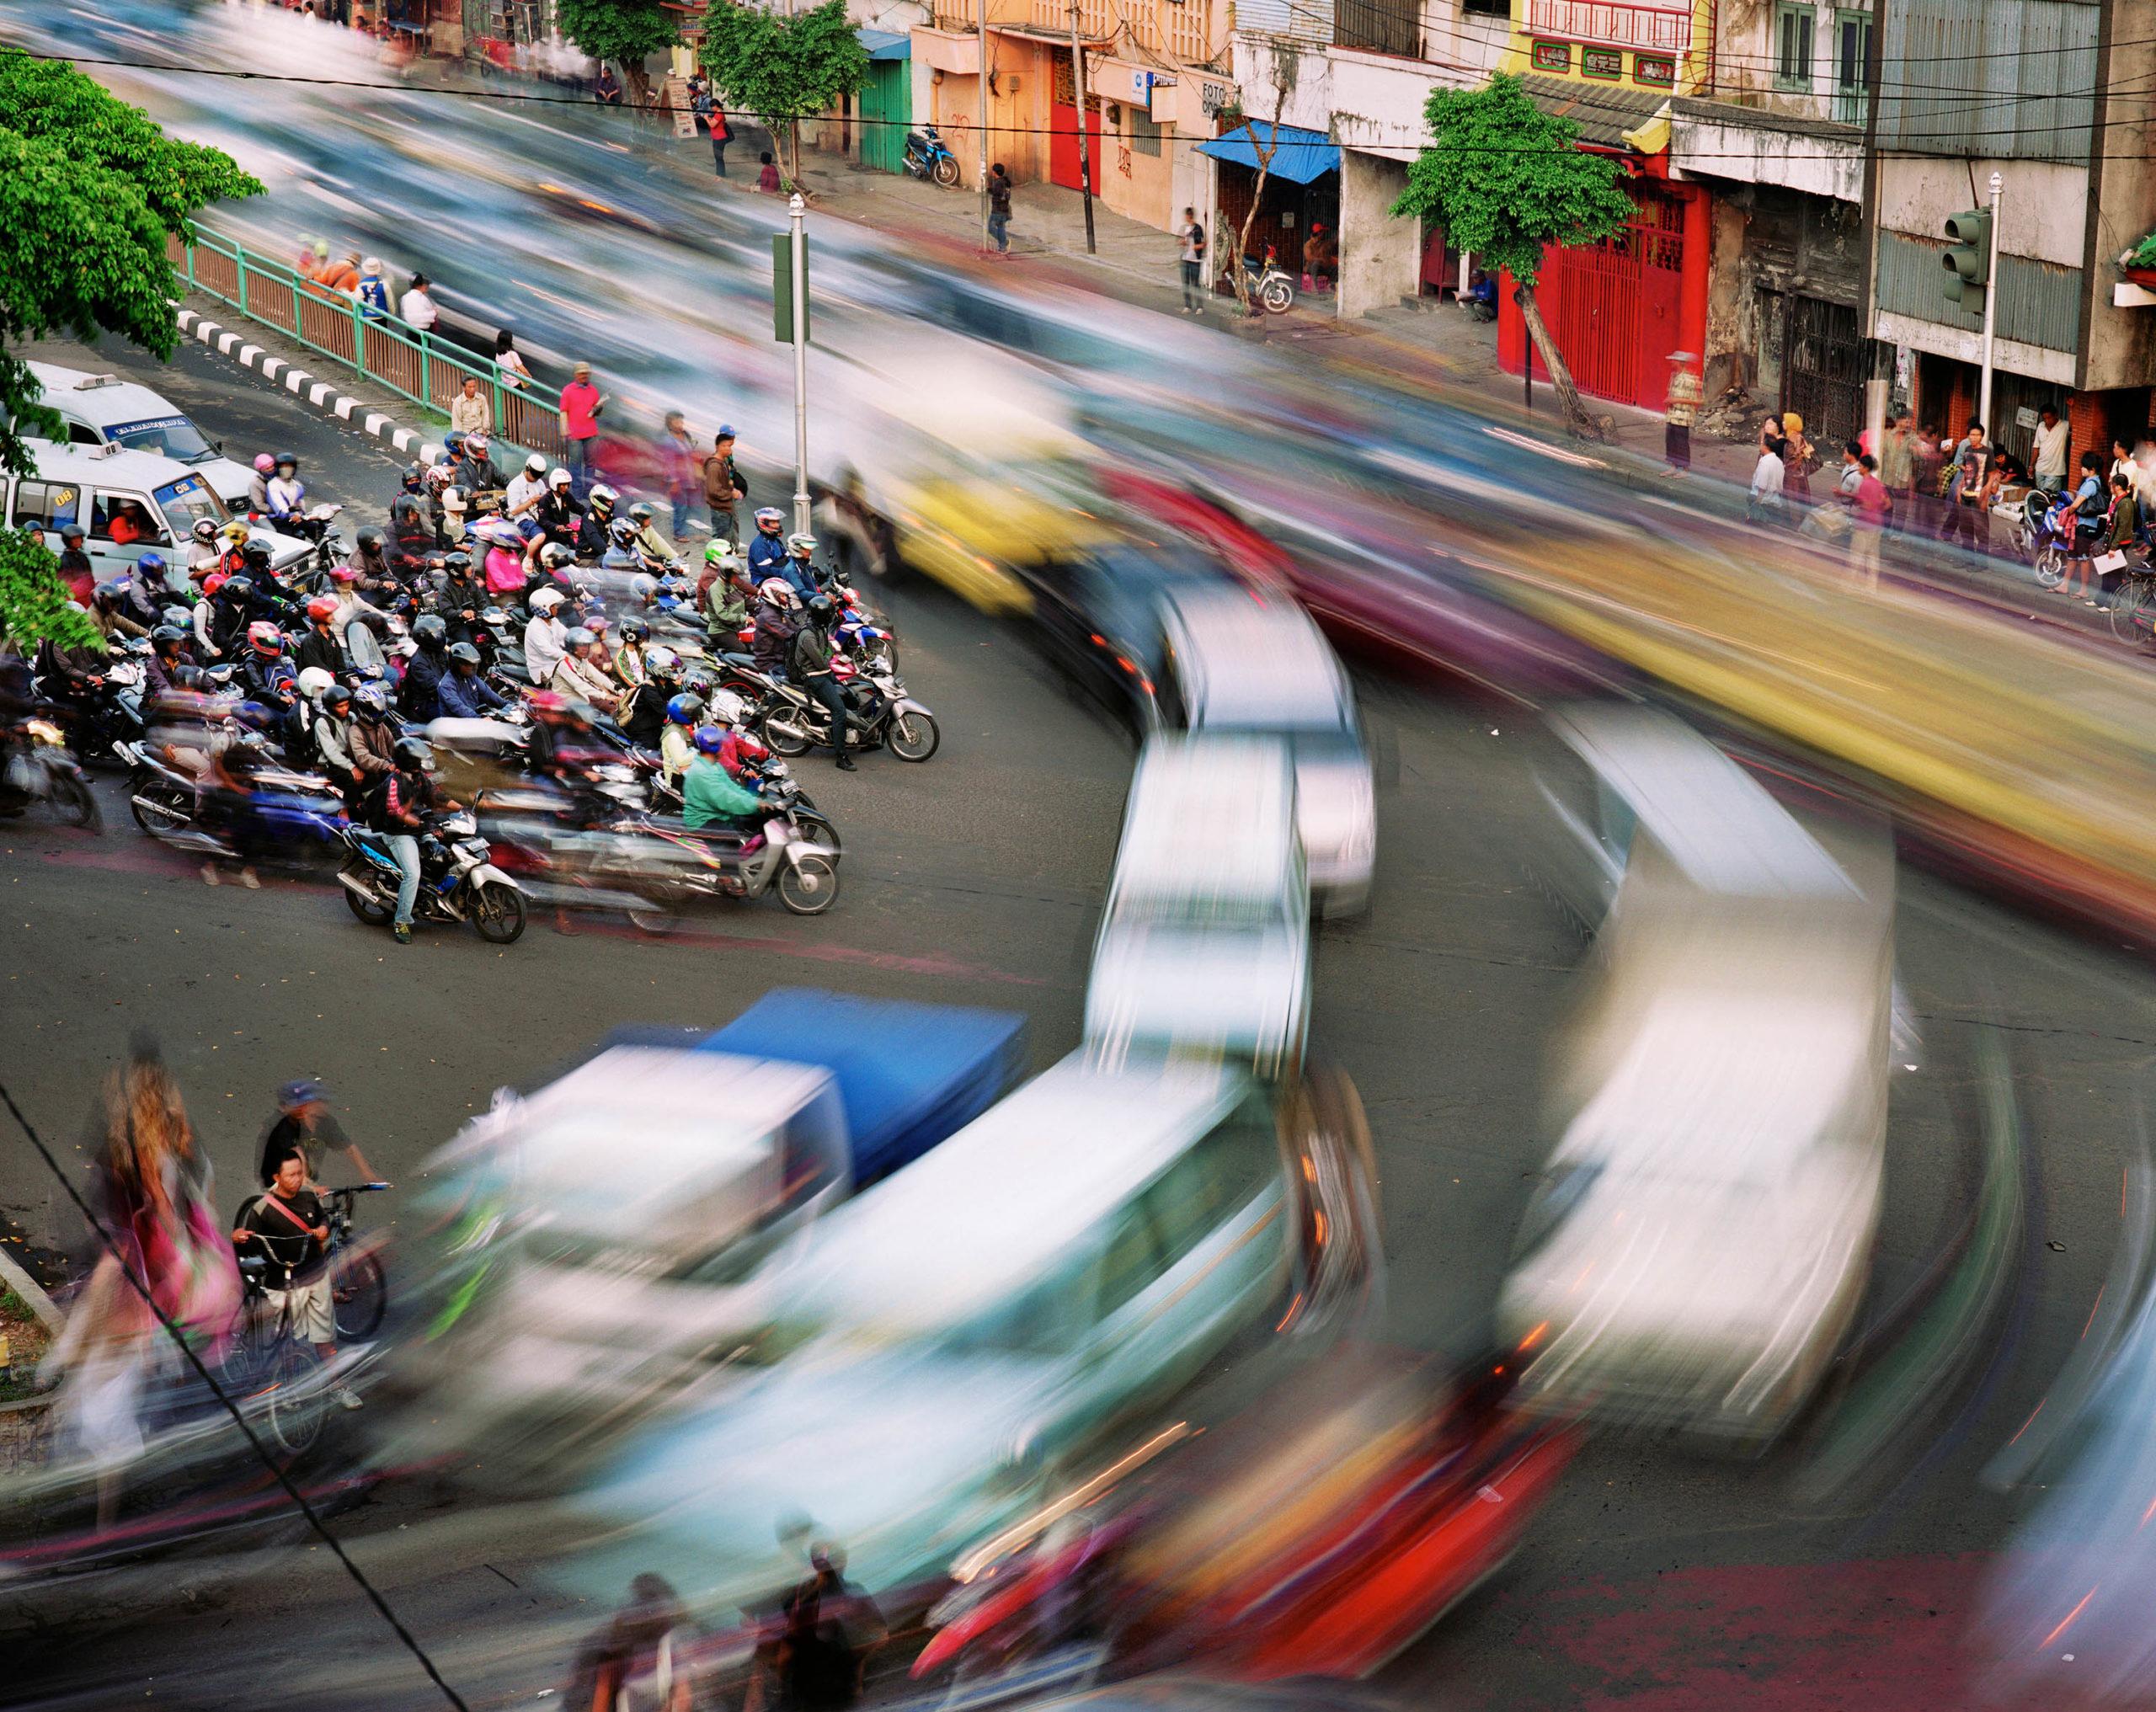 Jalan Jembatan Batu, Tamansari, Jakarta, Indonesia